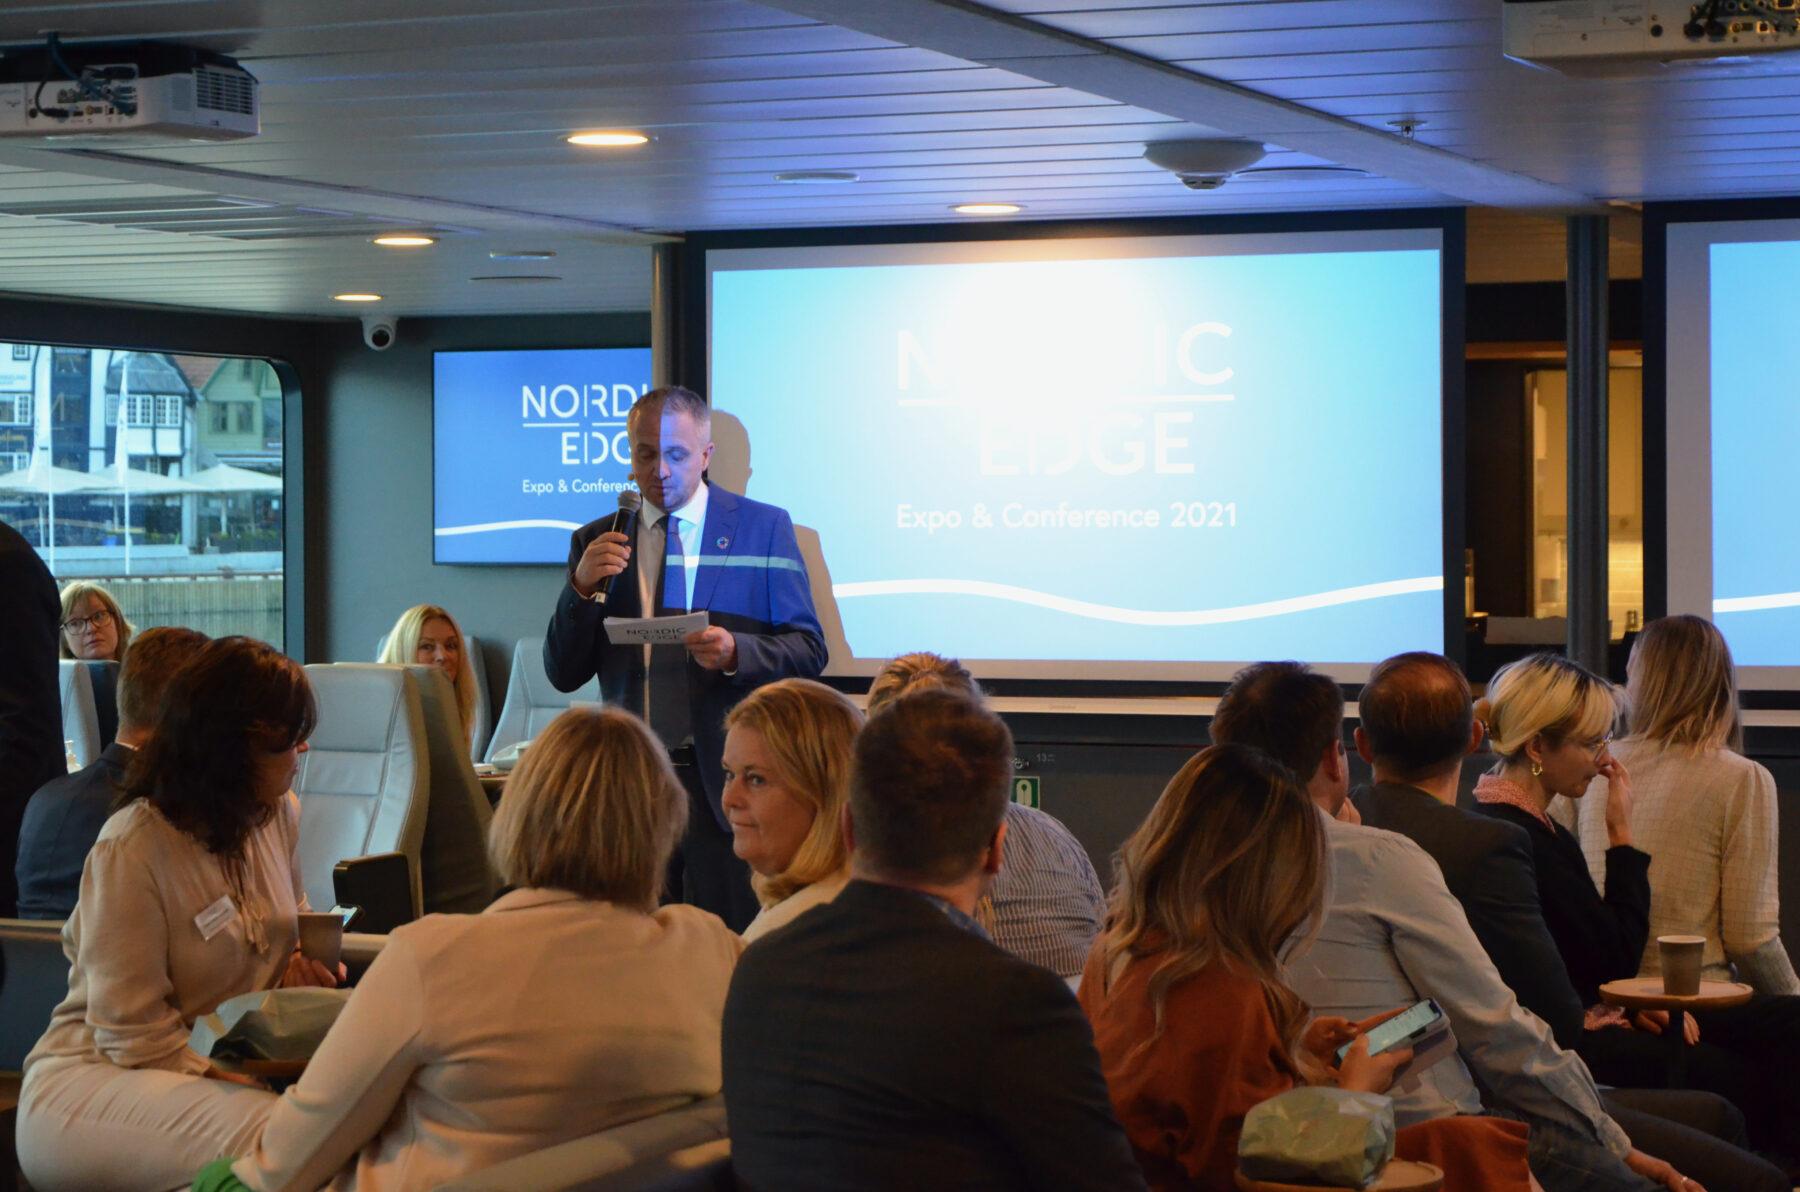 Nordic Edge Expo 2021 Kicks Off